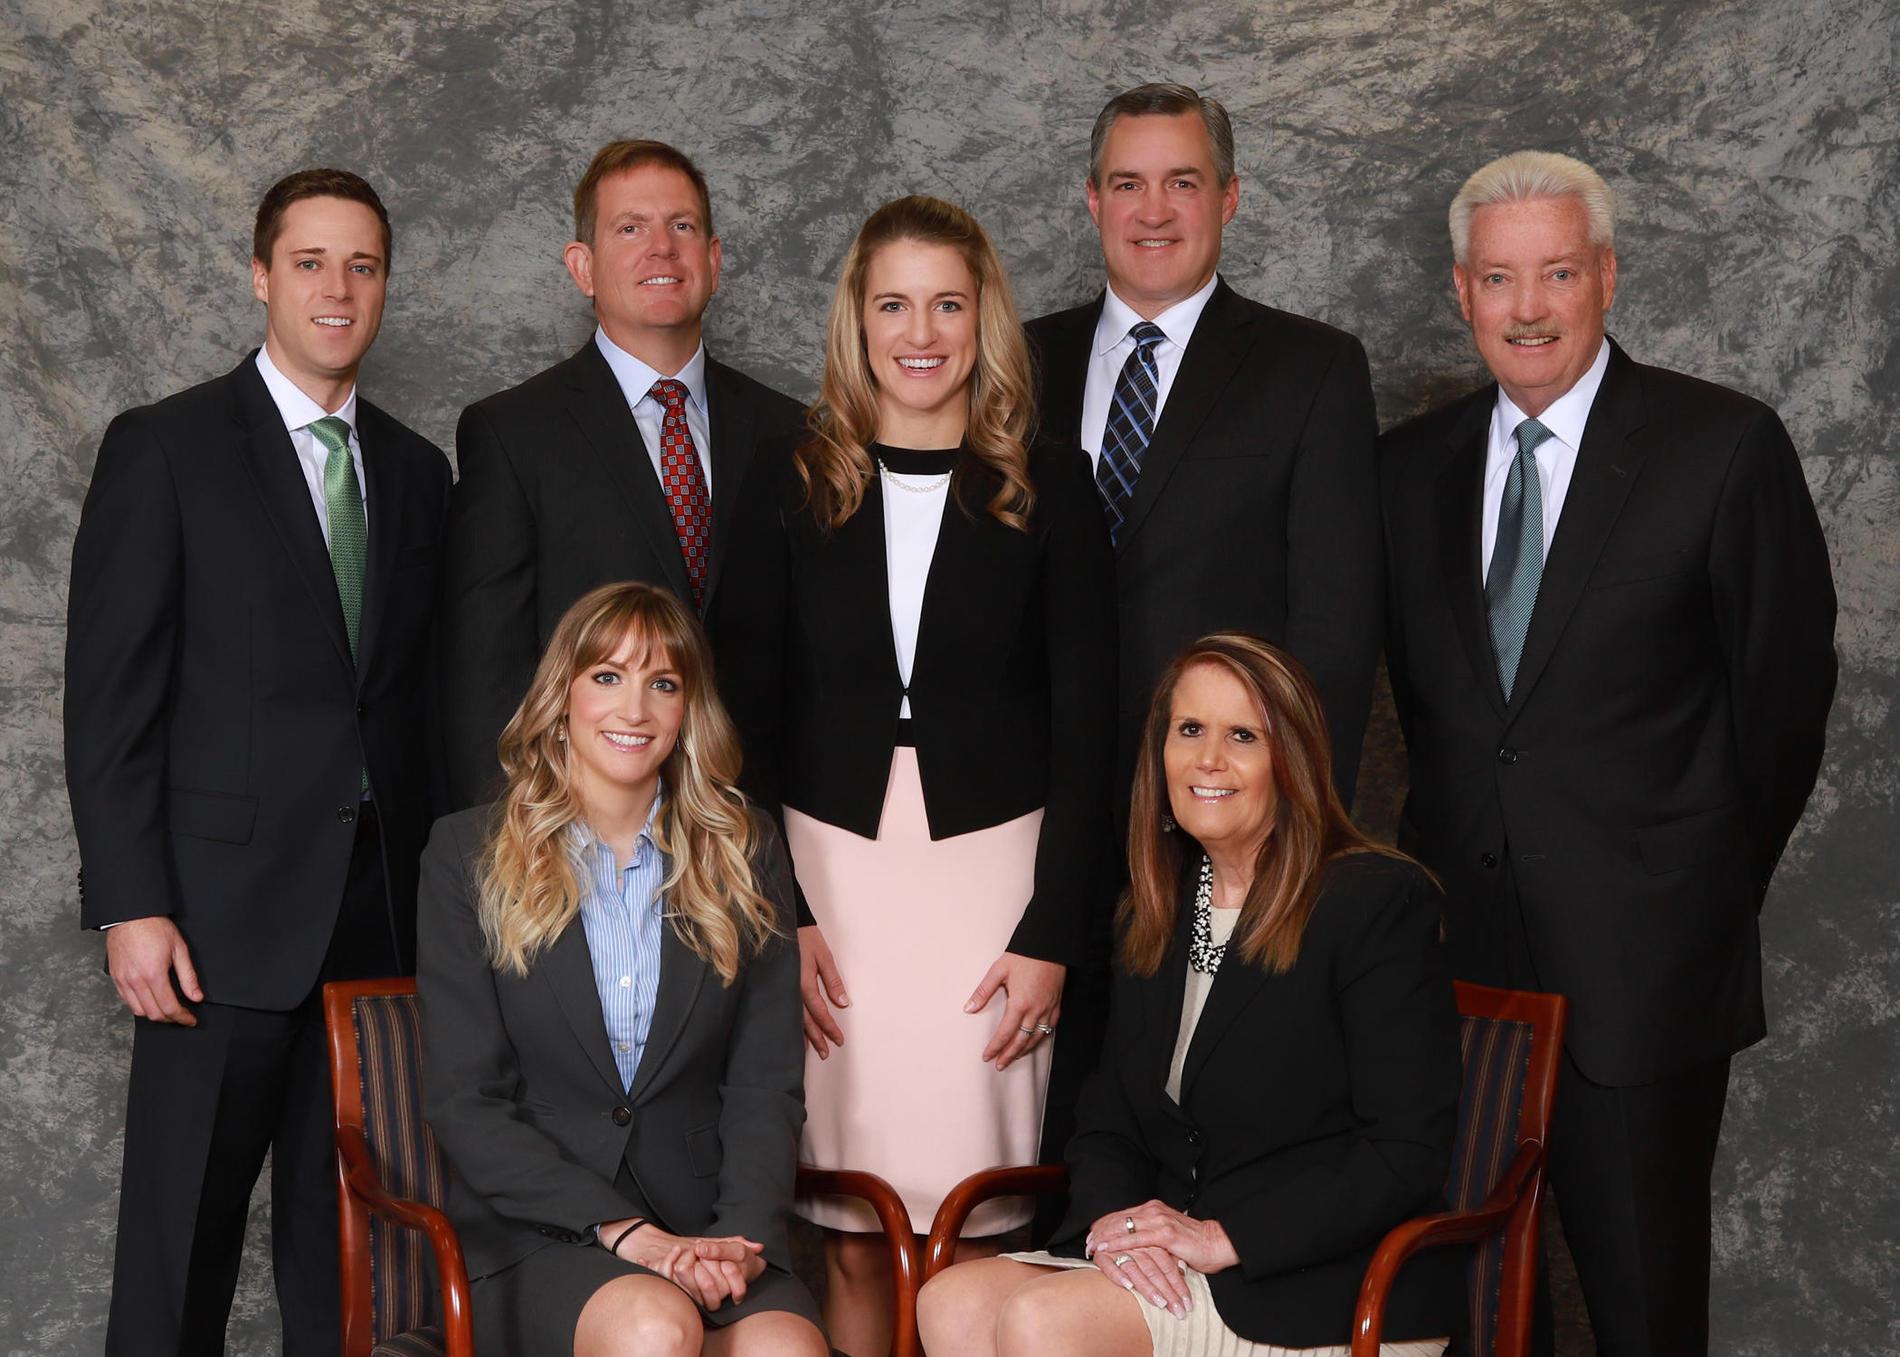 The Milestone Group | Davenport, IA | Morgan Stanley Wealth Management